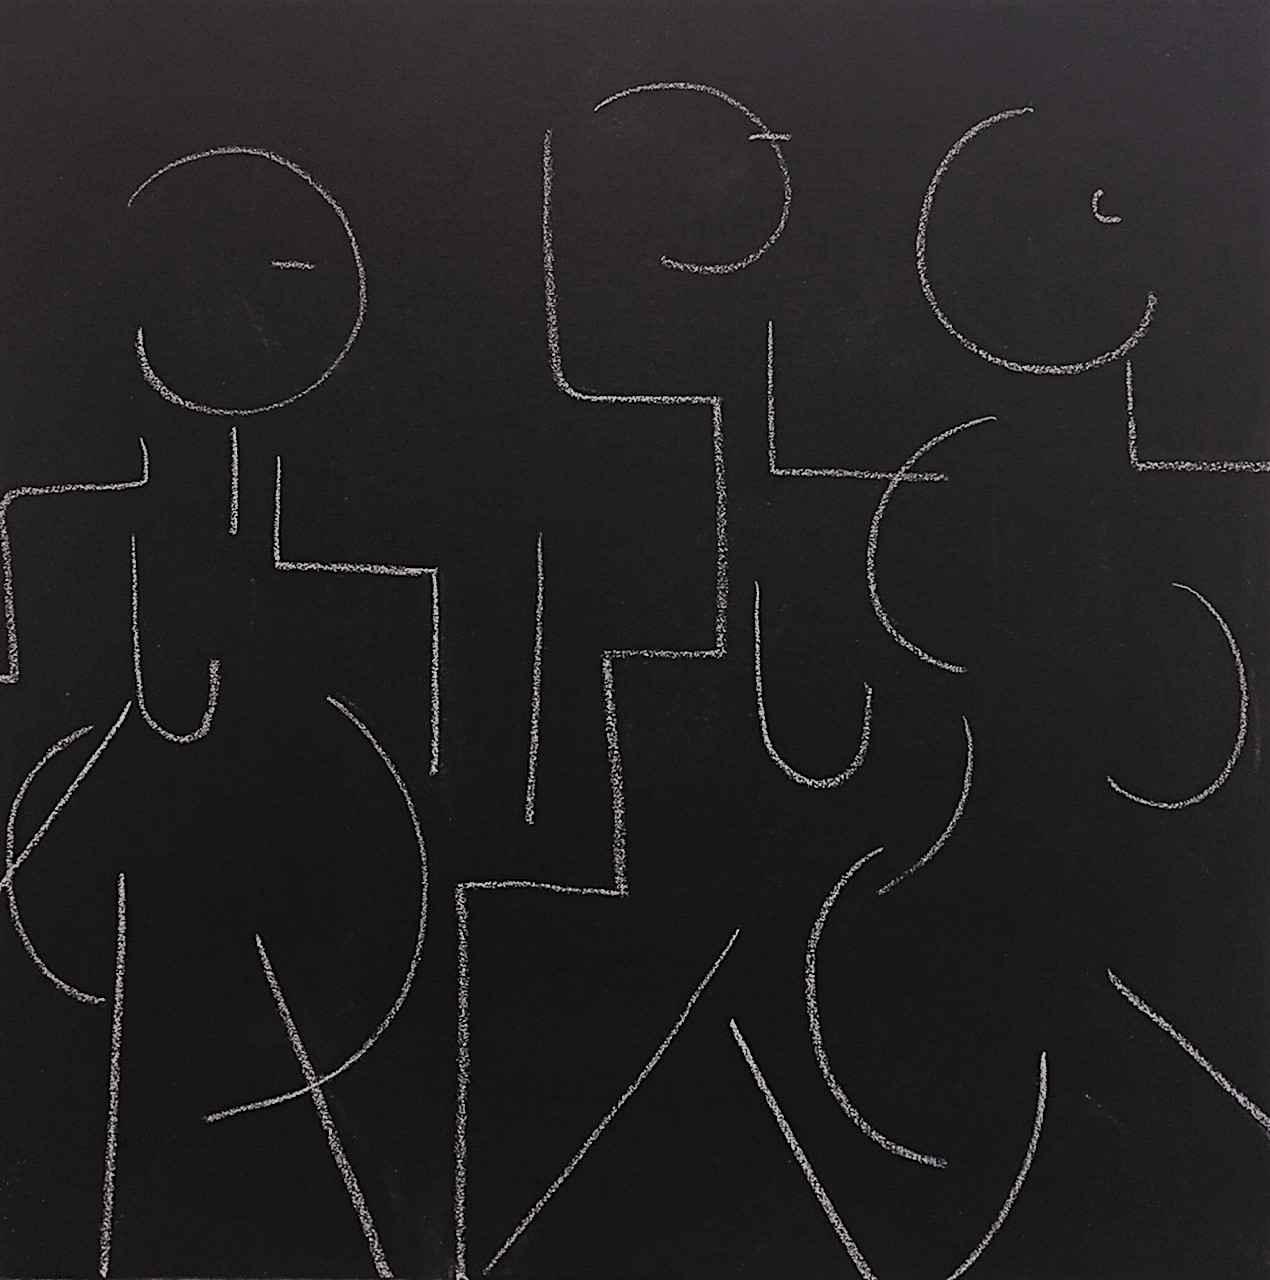 Women as Heiroglyphic... by  Steve Lyons - Masterpiece Online